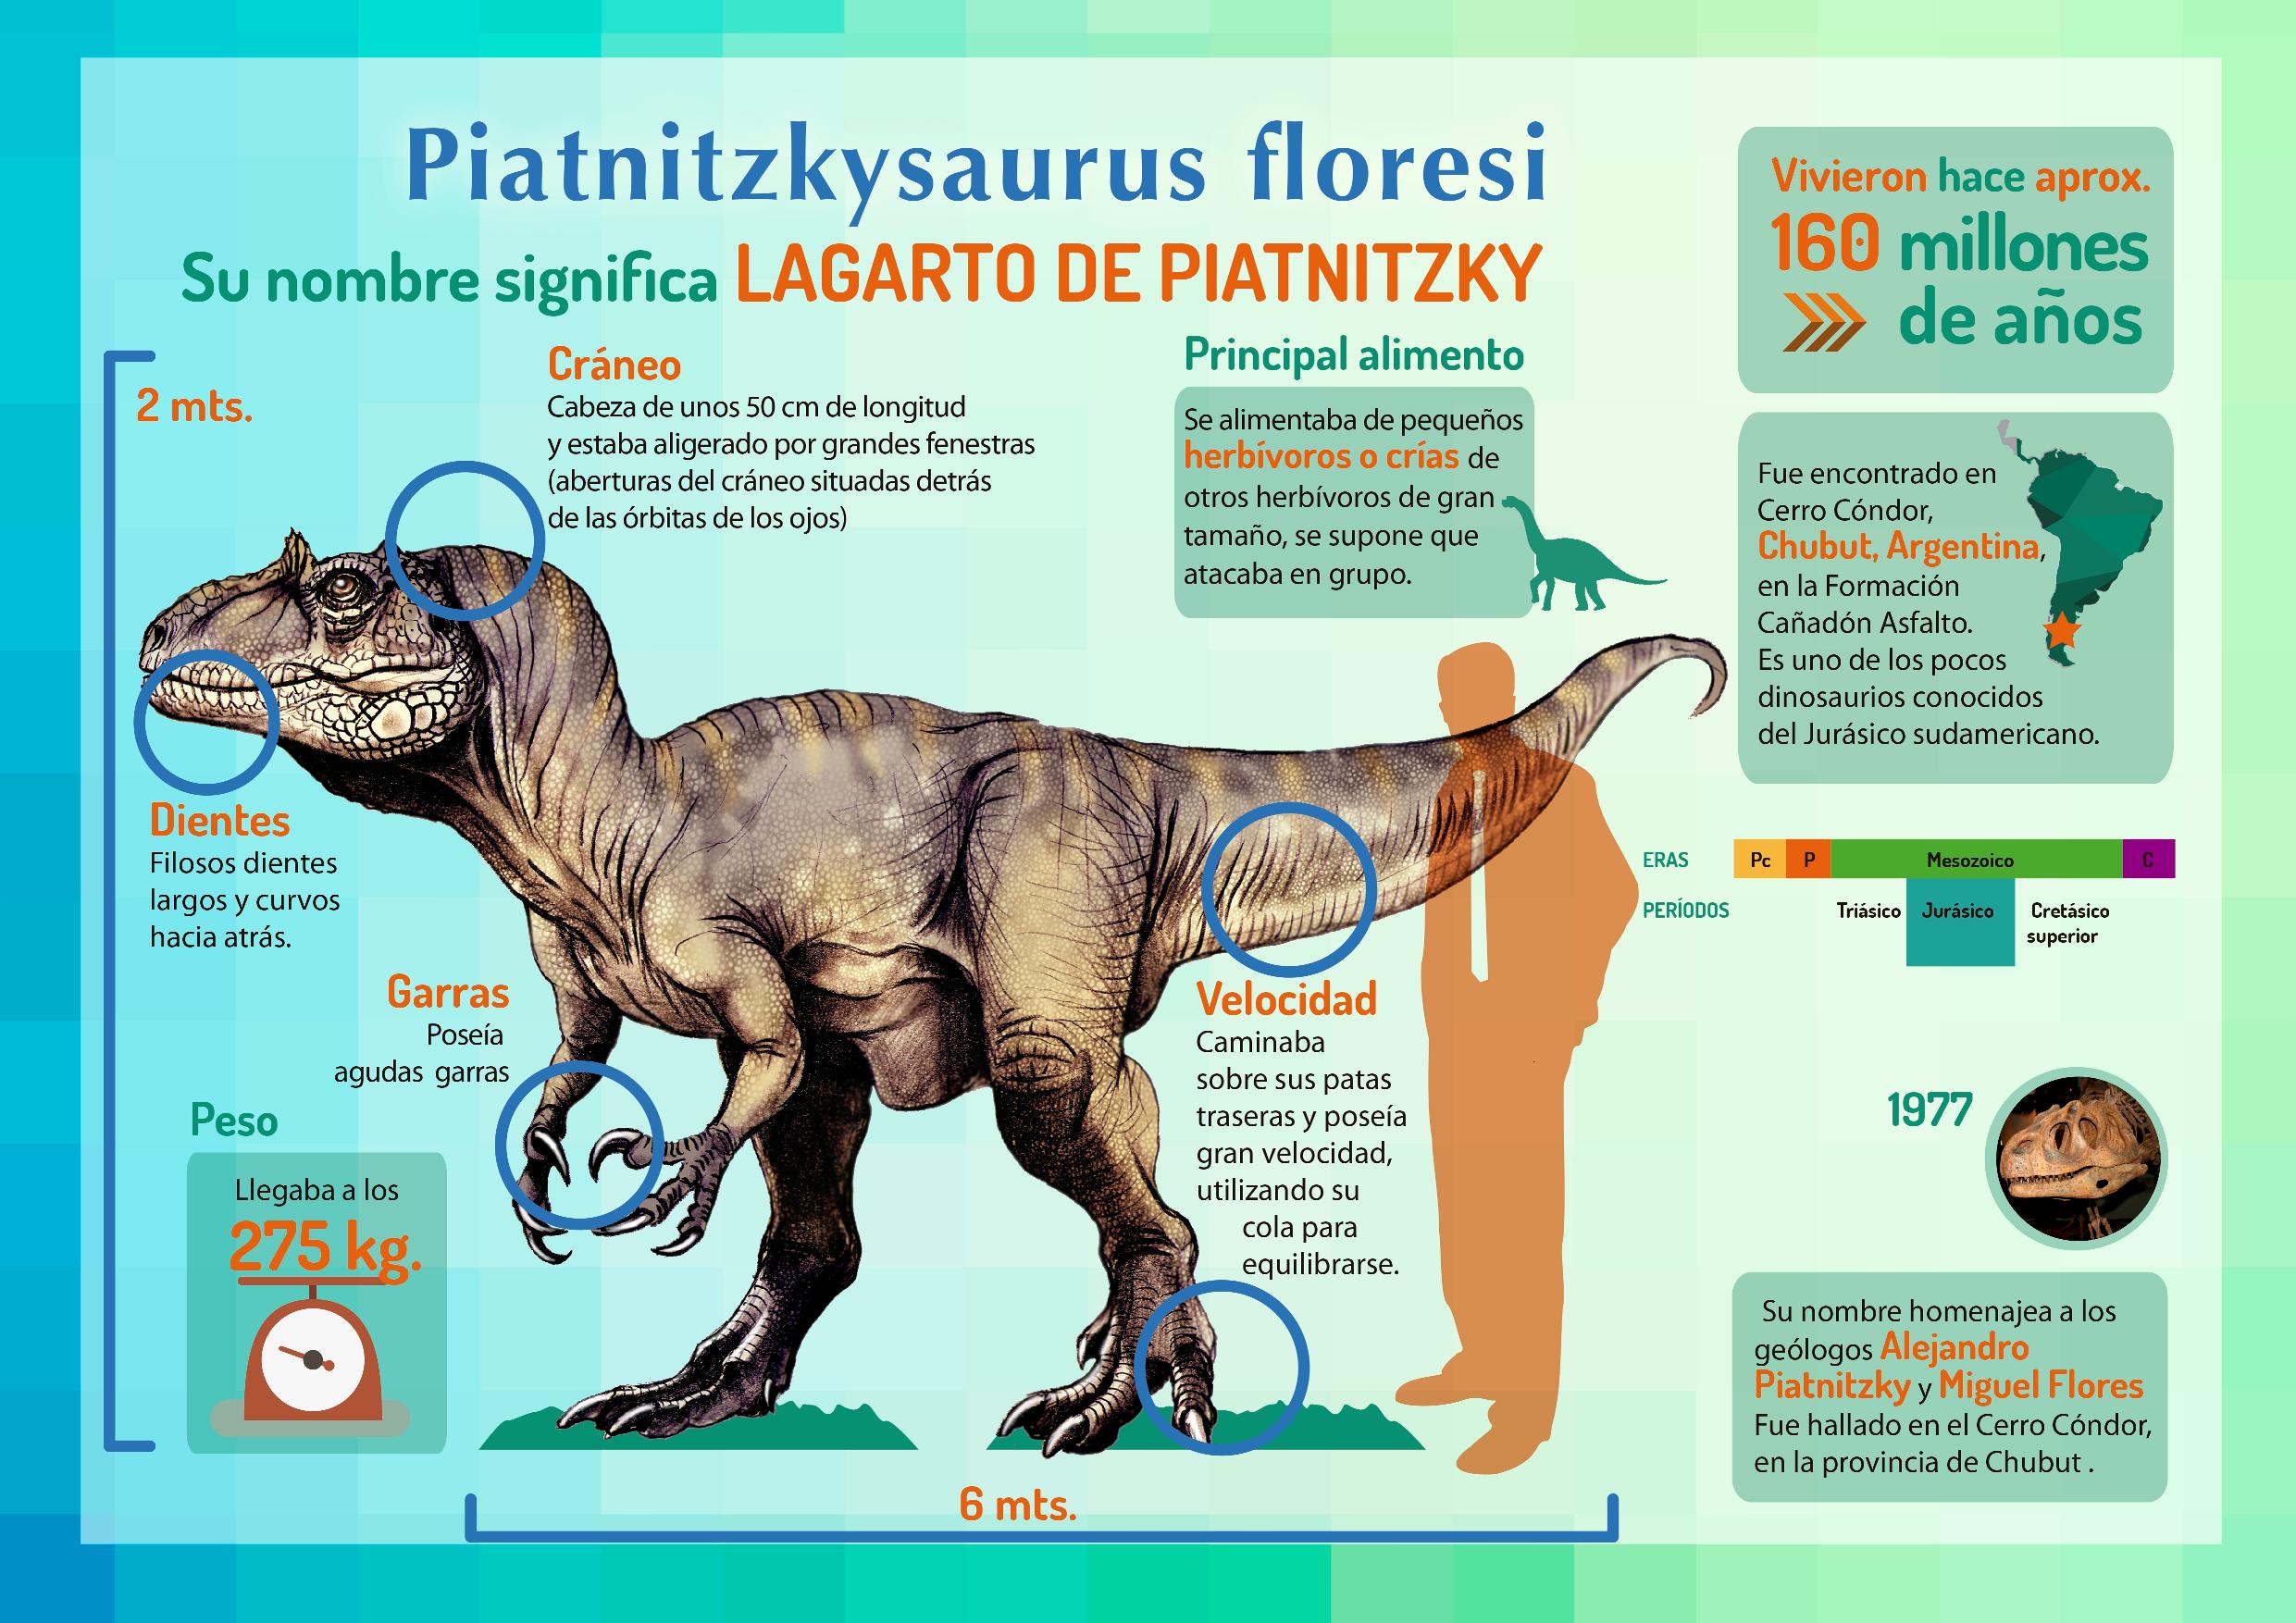 Piatniskysaurus floresi